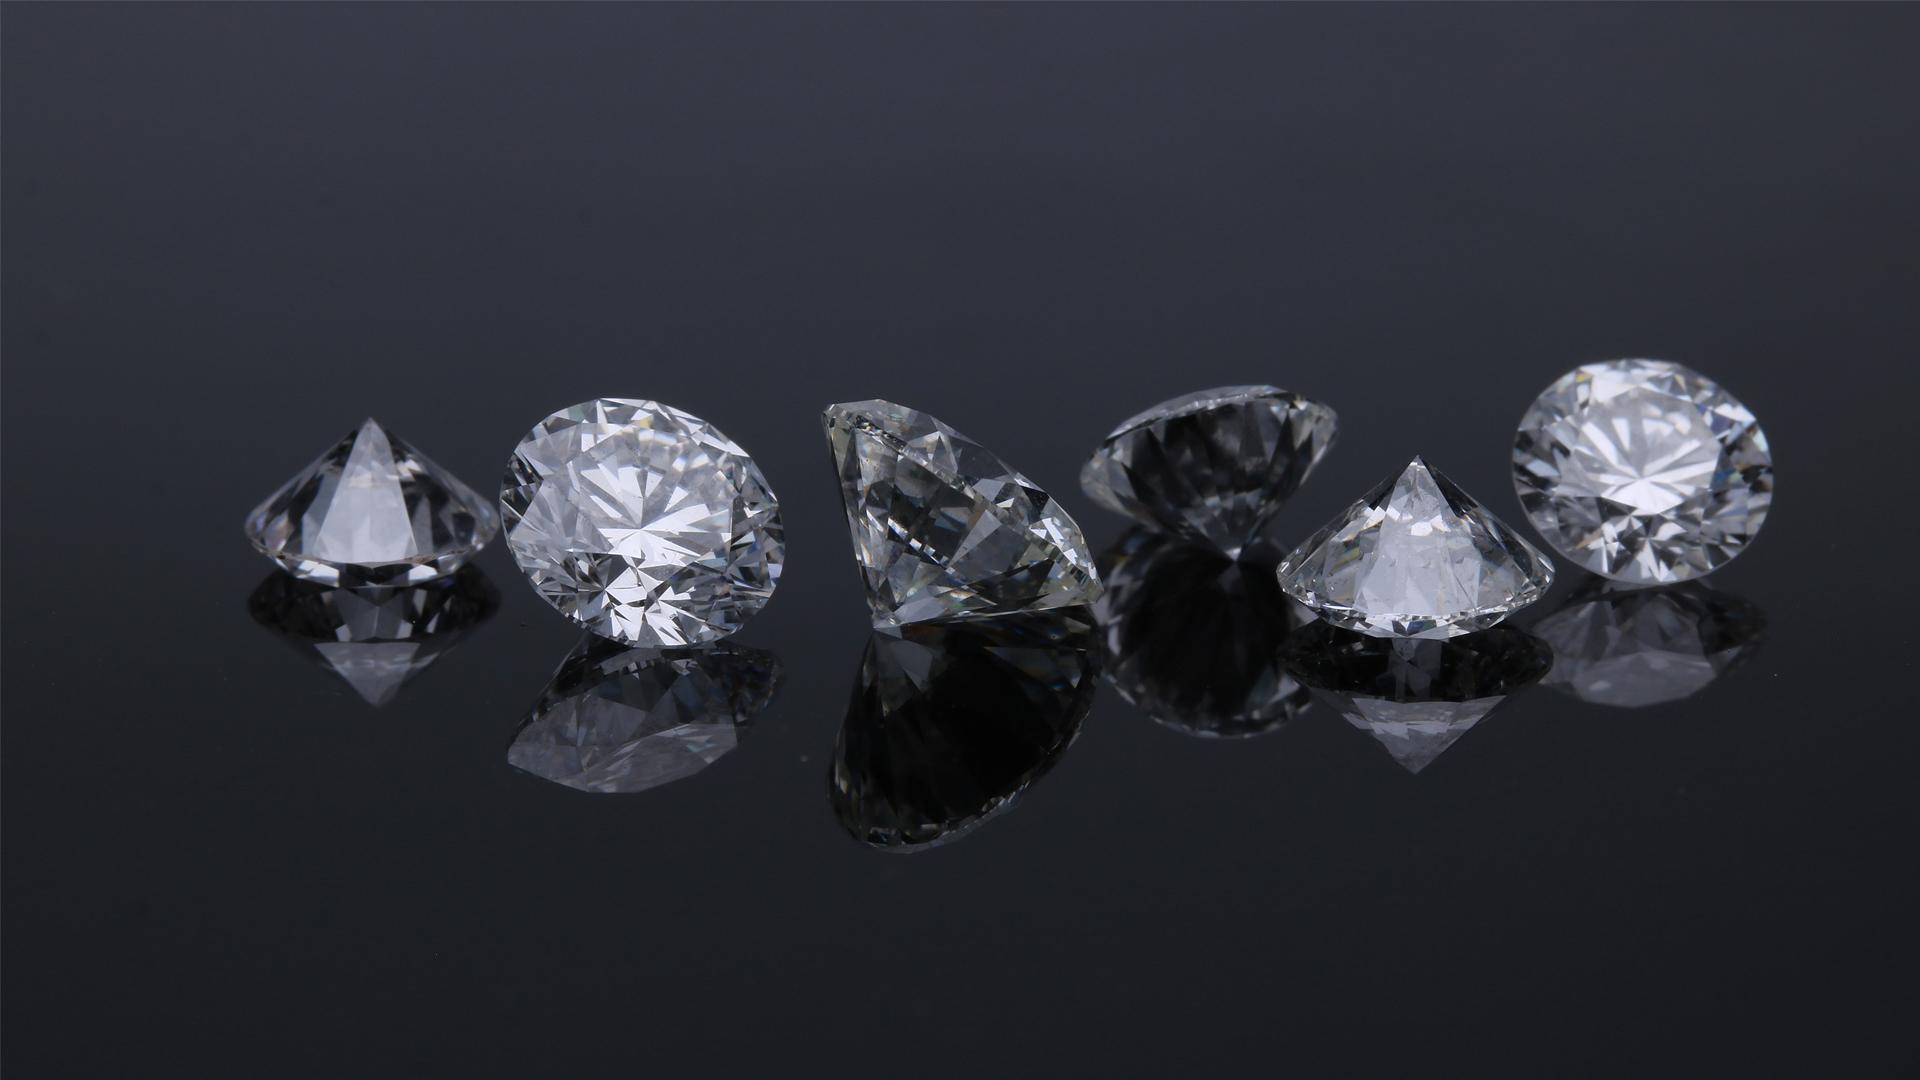 Botswana Searches For 'New Diamonds' To Diversify Economy